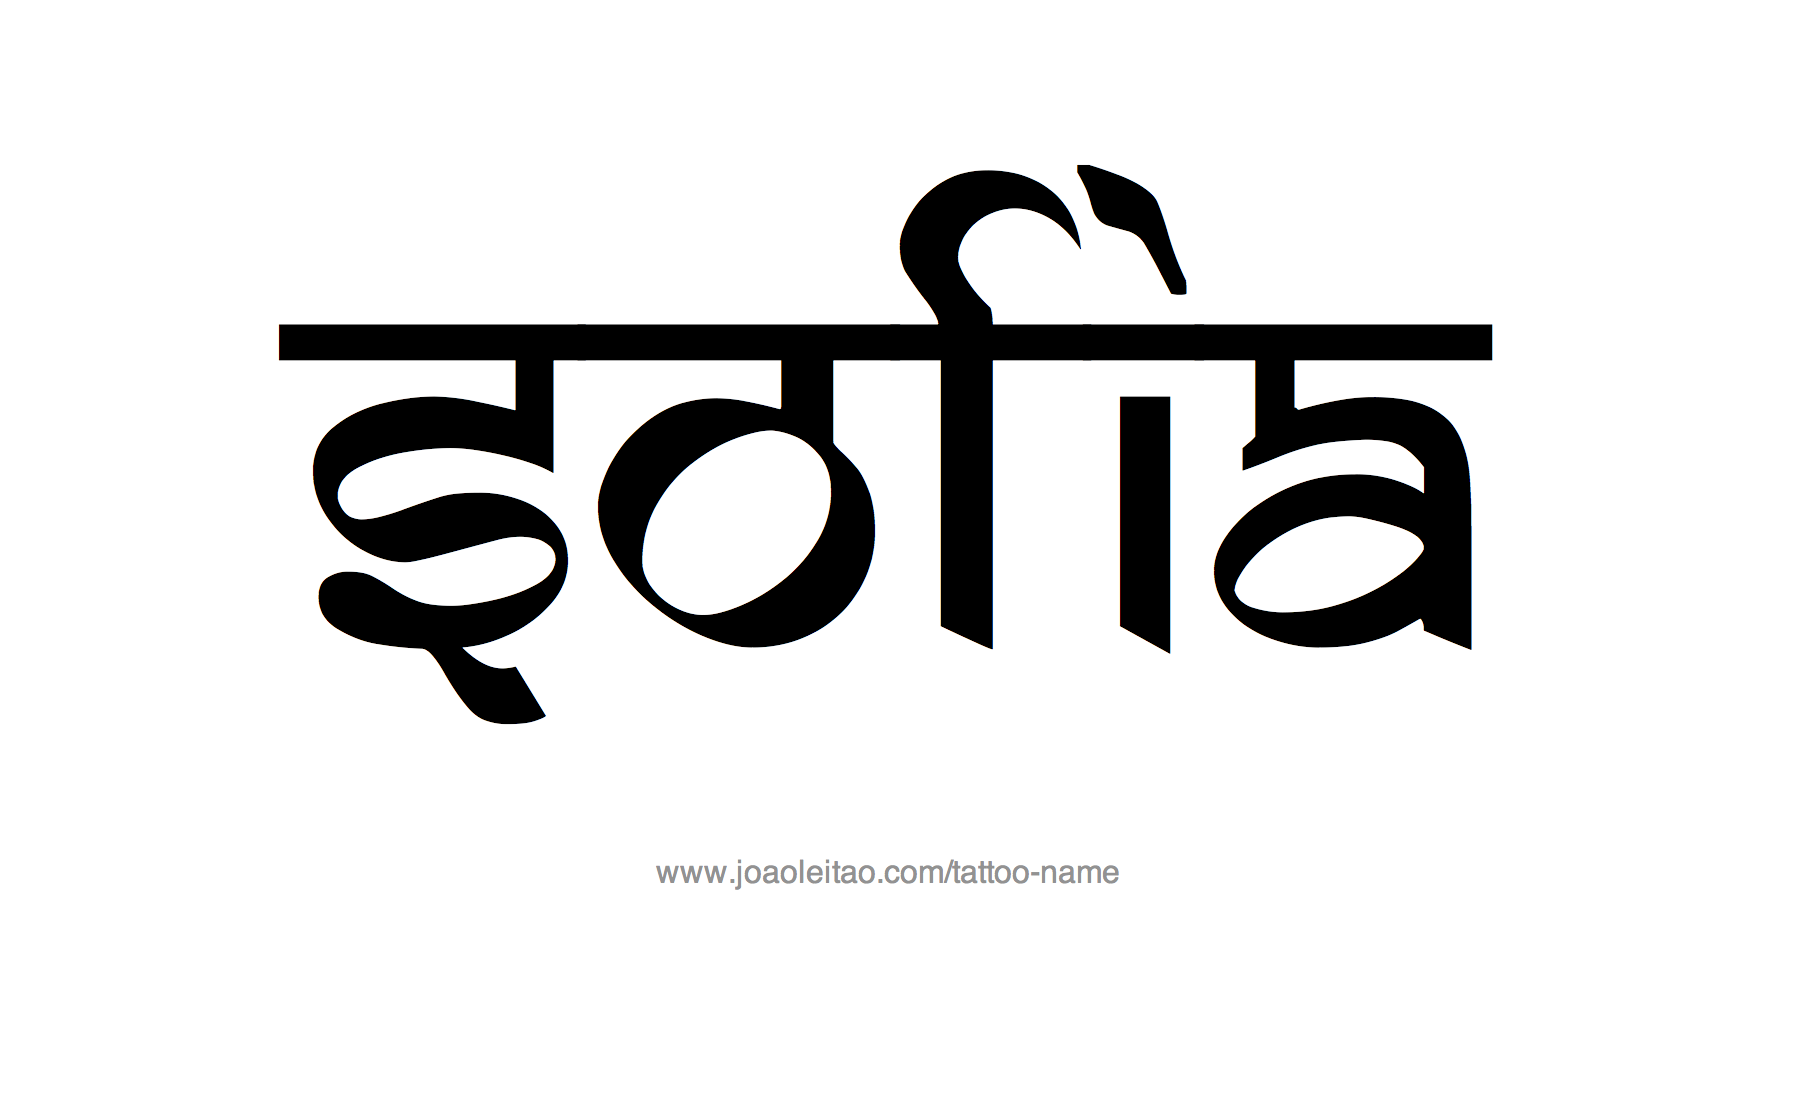 Sofia Name Tattoo Designs : tattoo design female name sofia2020 from www.joaoleitao.com size 1800 x 1116 png 75kB